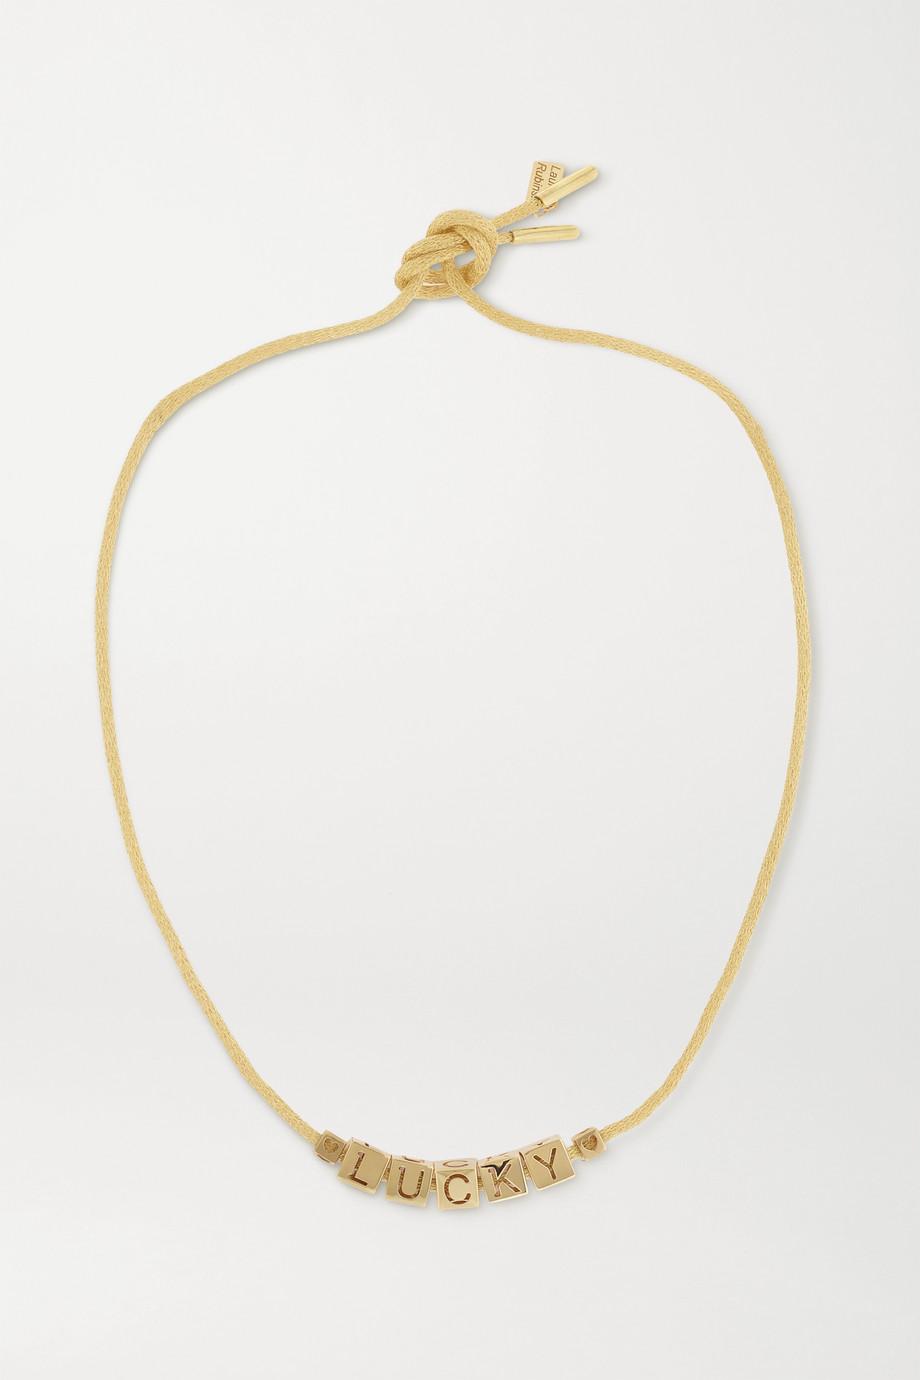 Lauren Rubinski Lucky 14-karat gold necklace